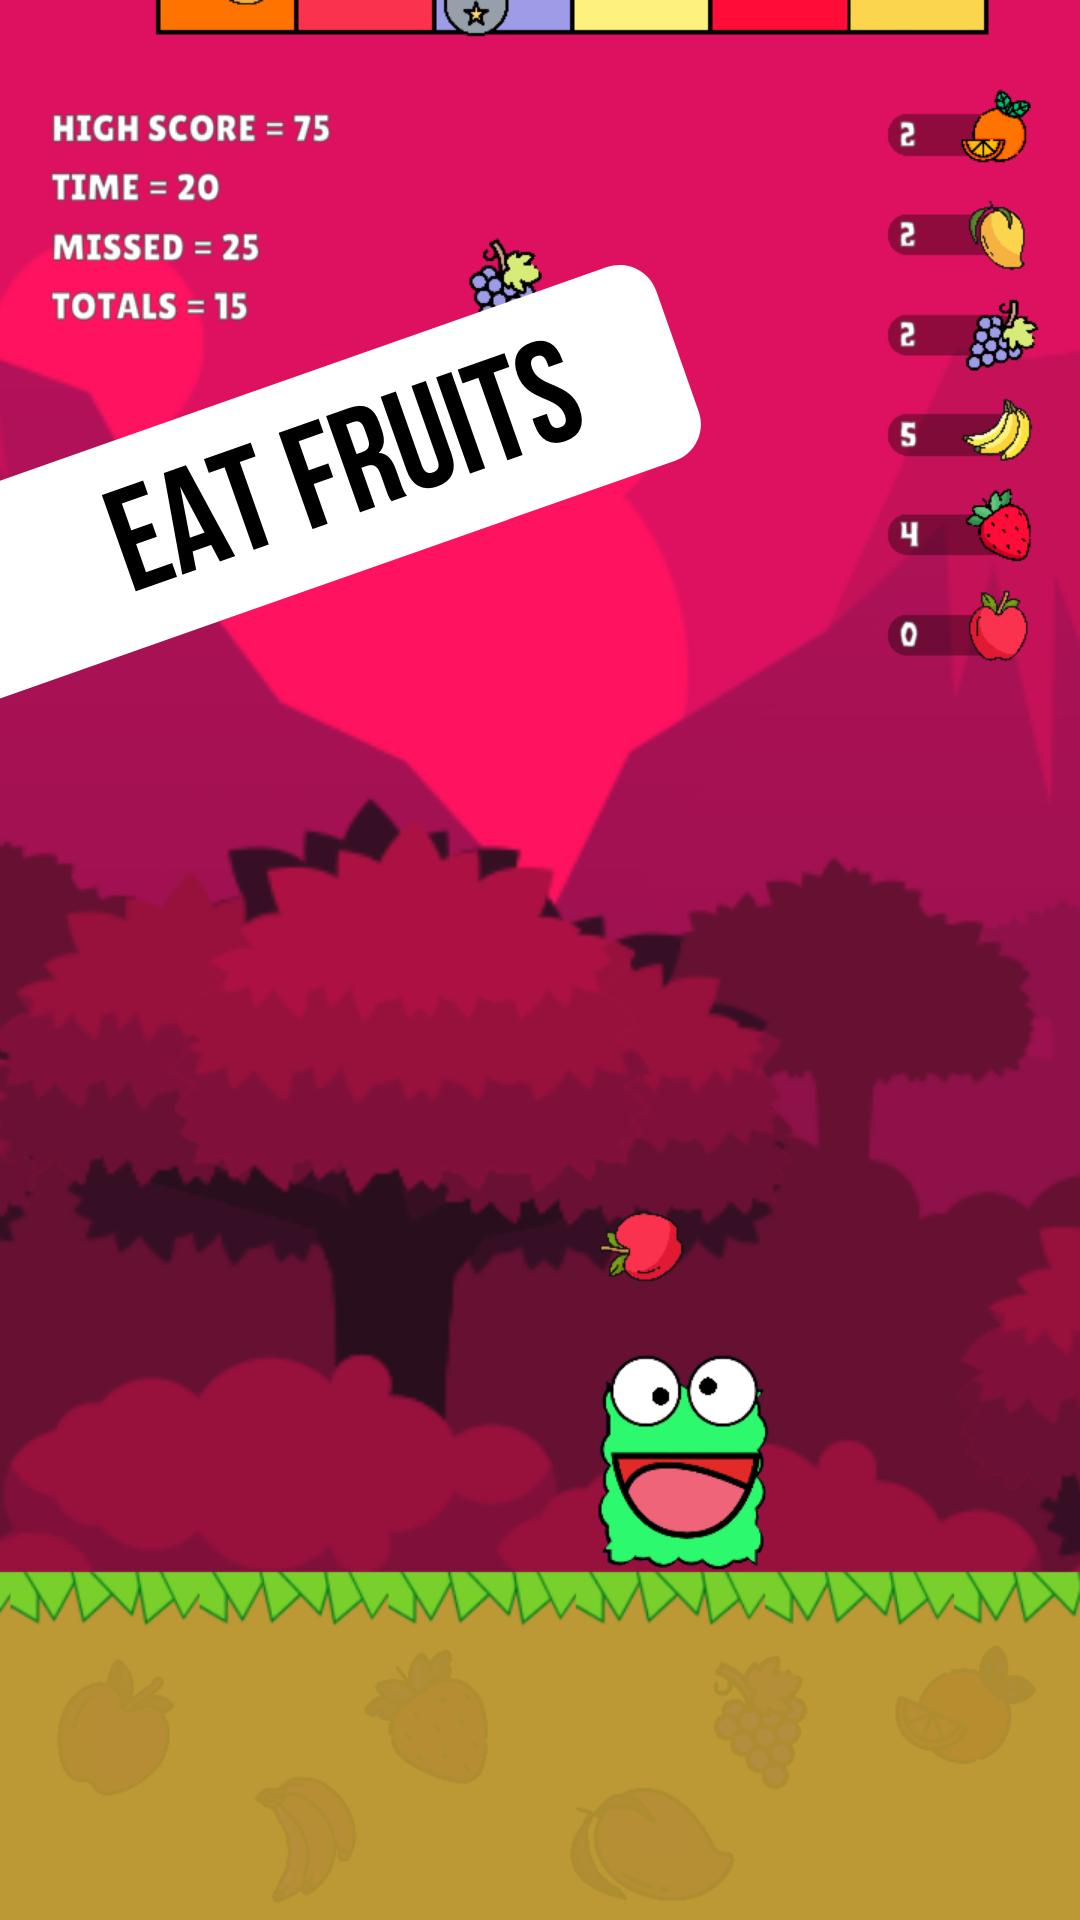 Fruitsdump - A Simple Hyper Casual Game